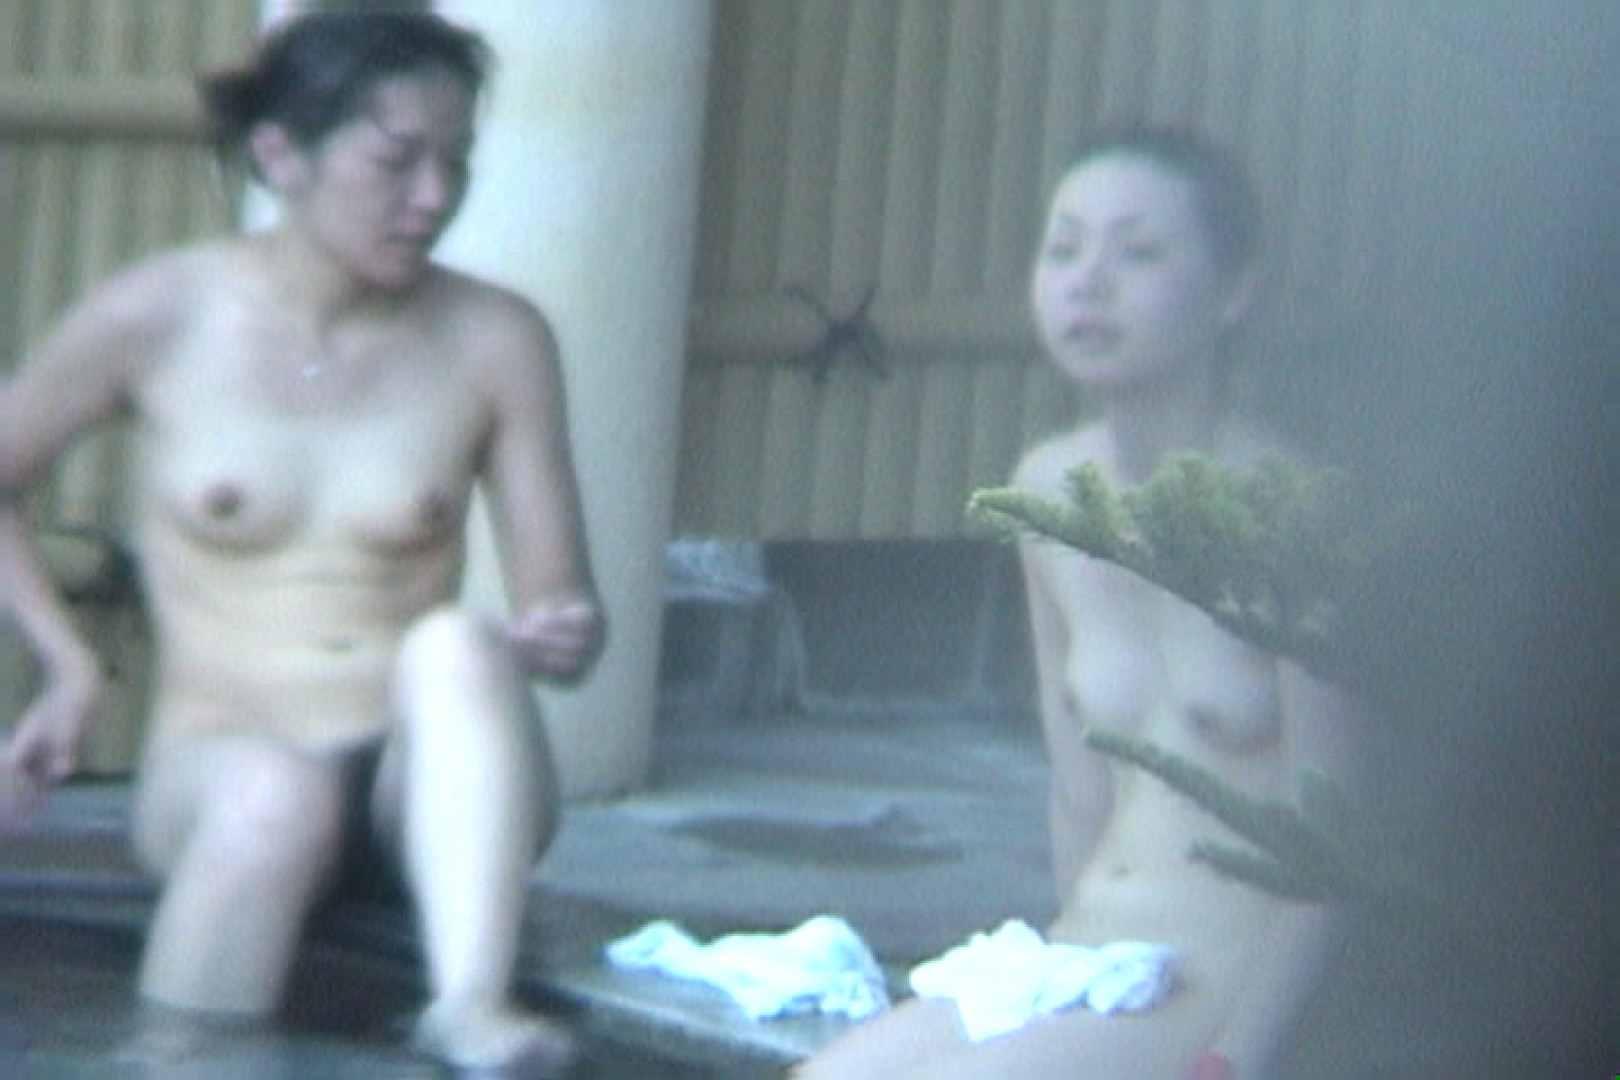 Aquaな露天風呂Vol.643 エッチな盗撮 盗み撮り動画 105pic 8